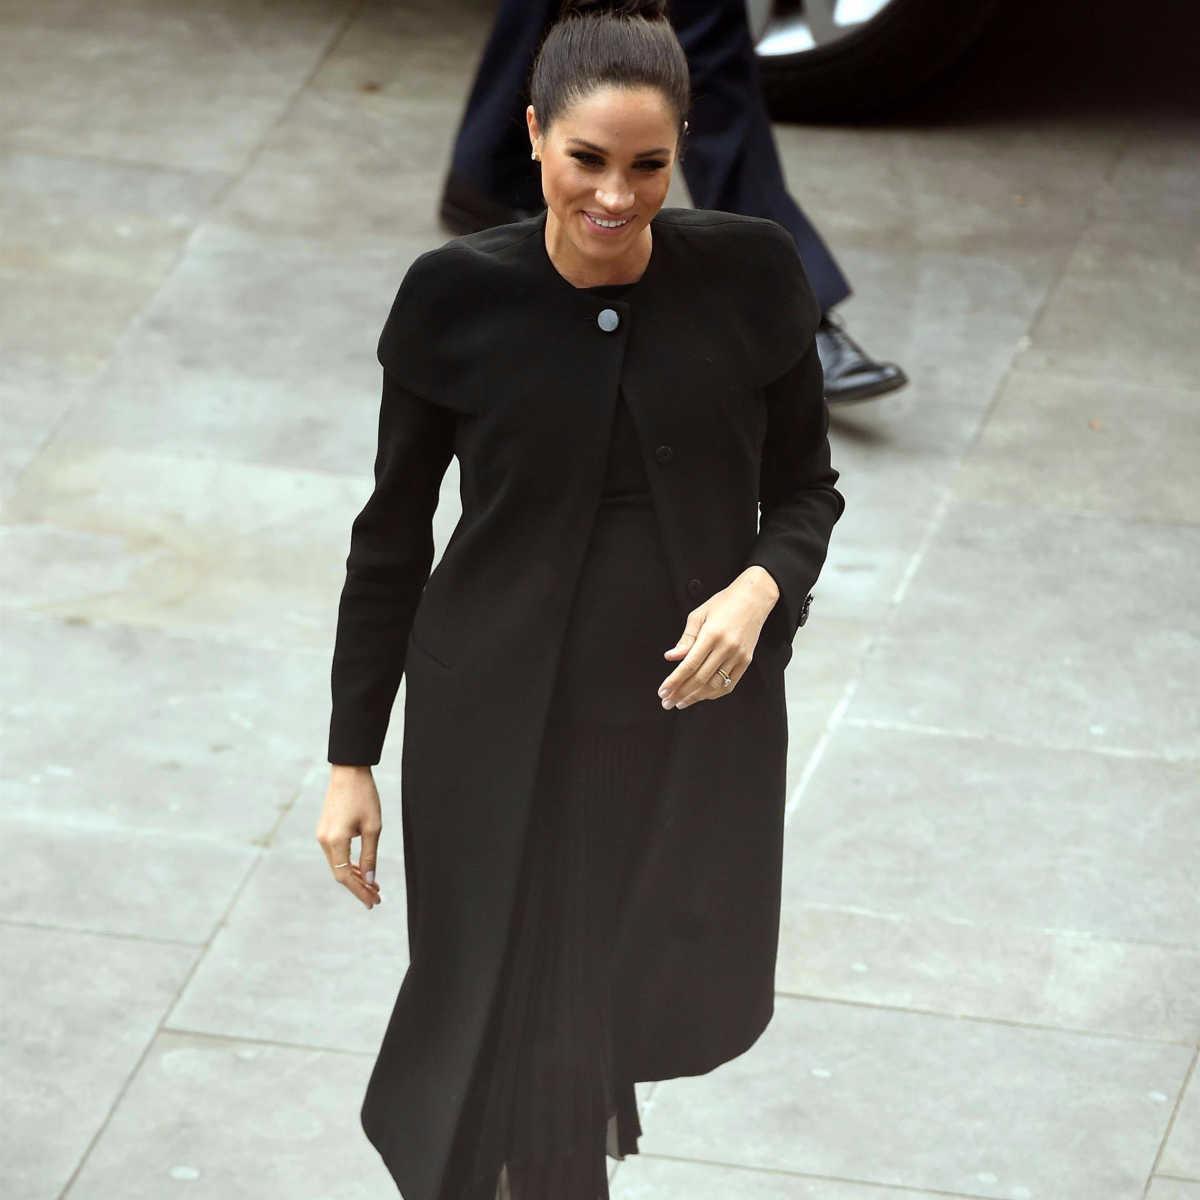 Bespoke Black Givenchy Coat - Meghan s Mirror 84219563efc80